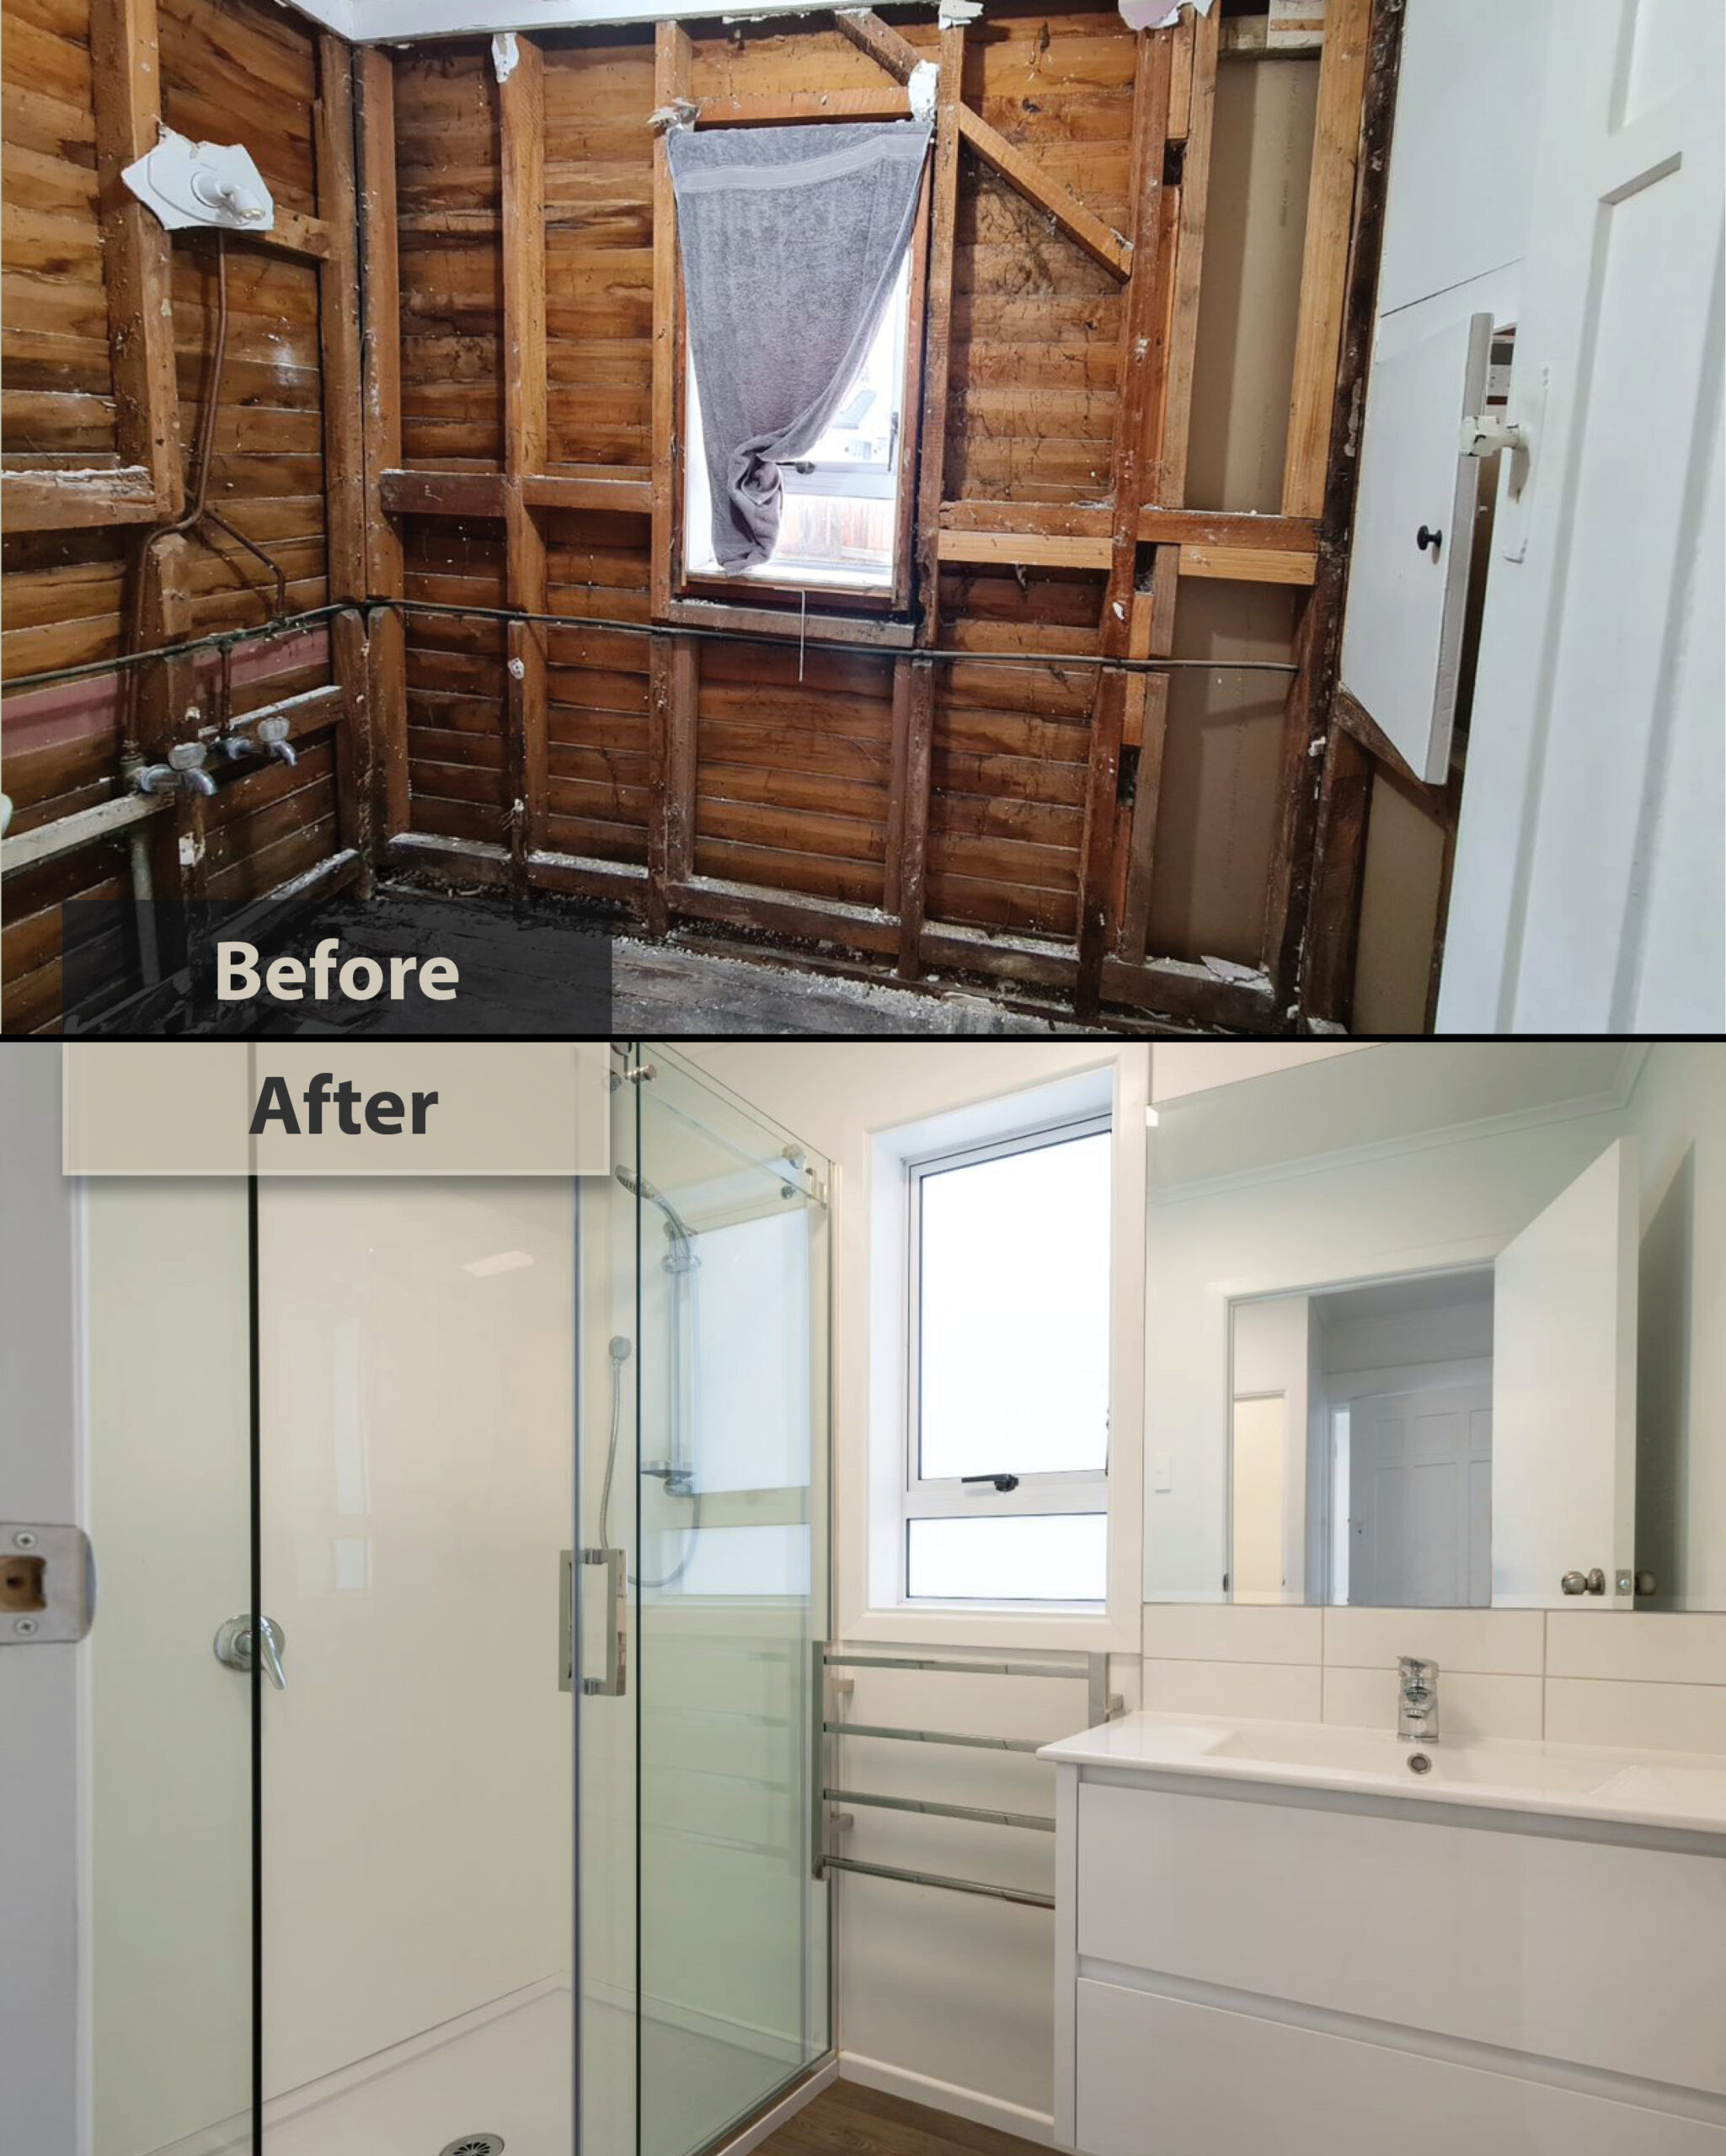 before and after bathroom renovation - Papatoetoe house renovation